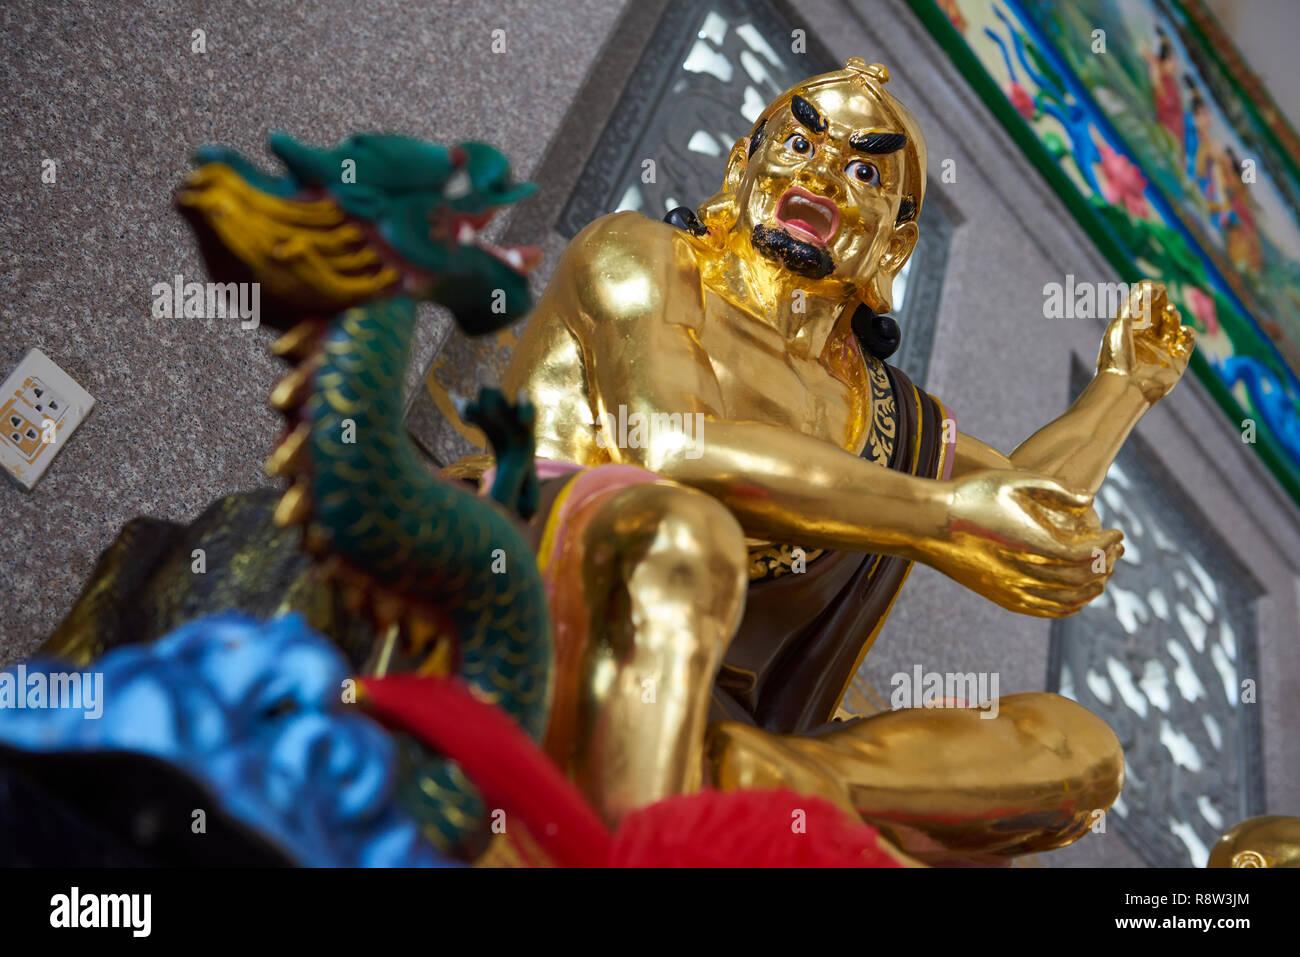 Detail of Gilt Lohan Arhat taming a dragon, inside Kuang Im Chapel, near River Kwai, Kanchanaburi, Thailand. Stock Photo